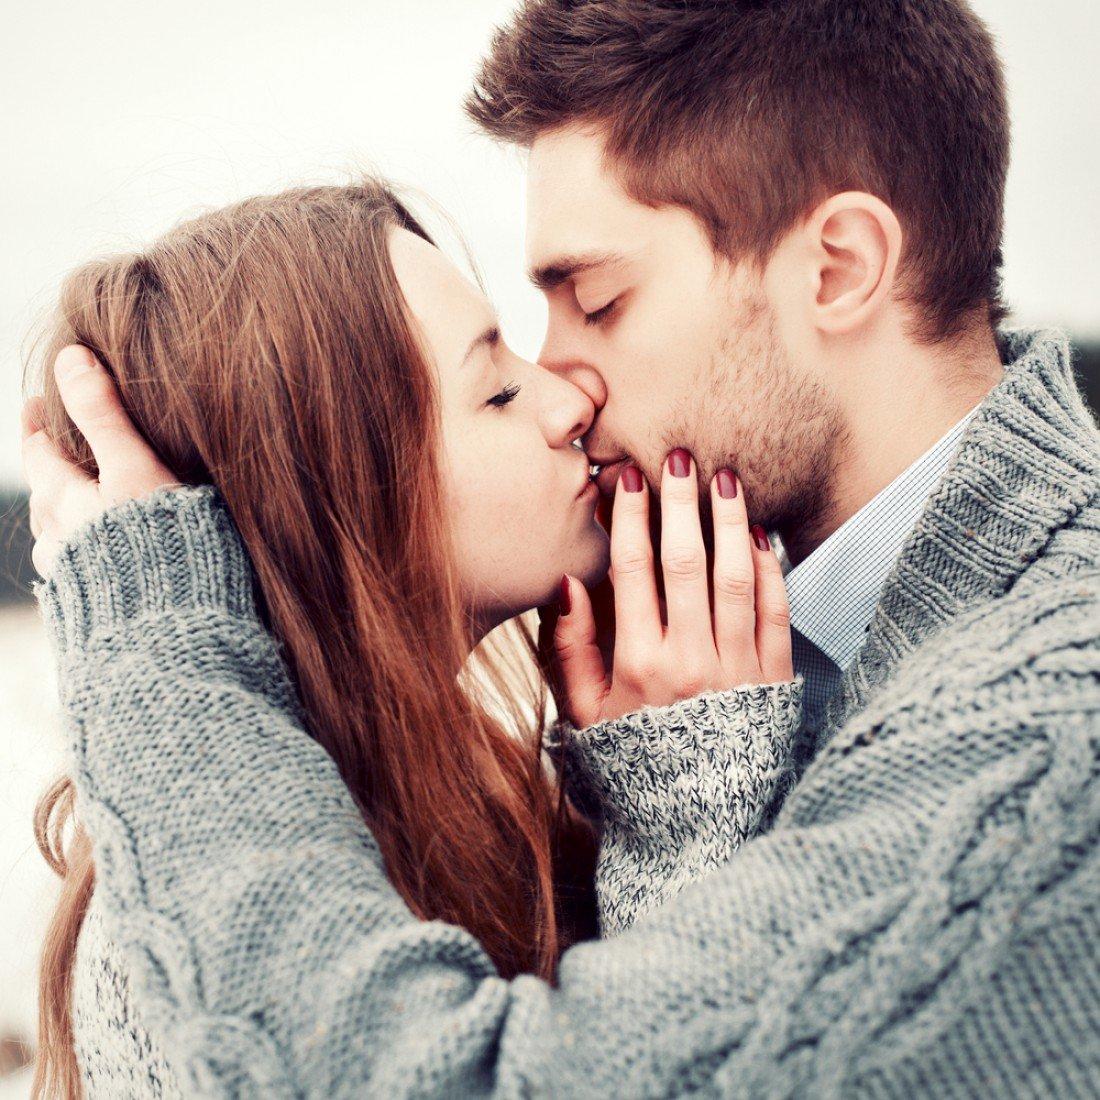 Картинки с поцелуем парня и девушки